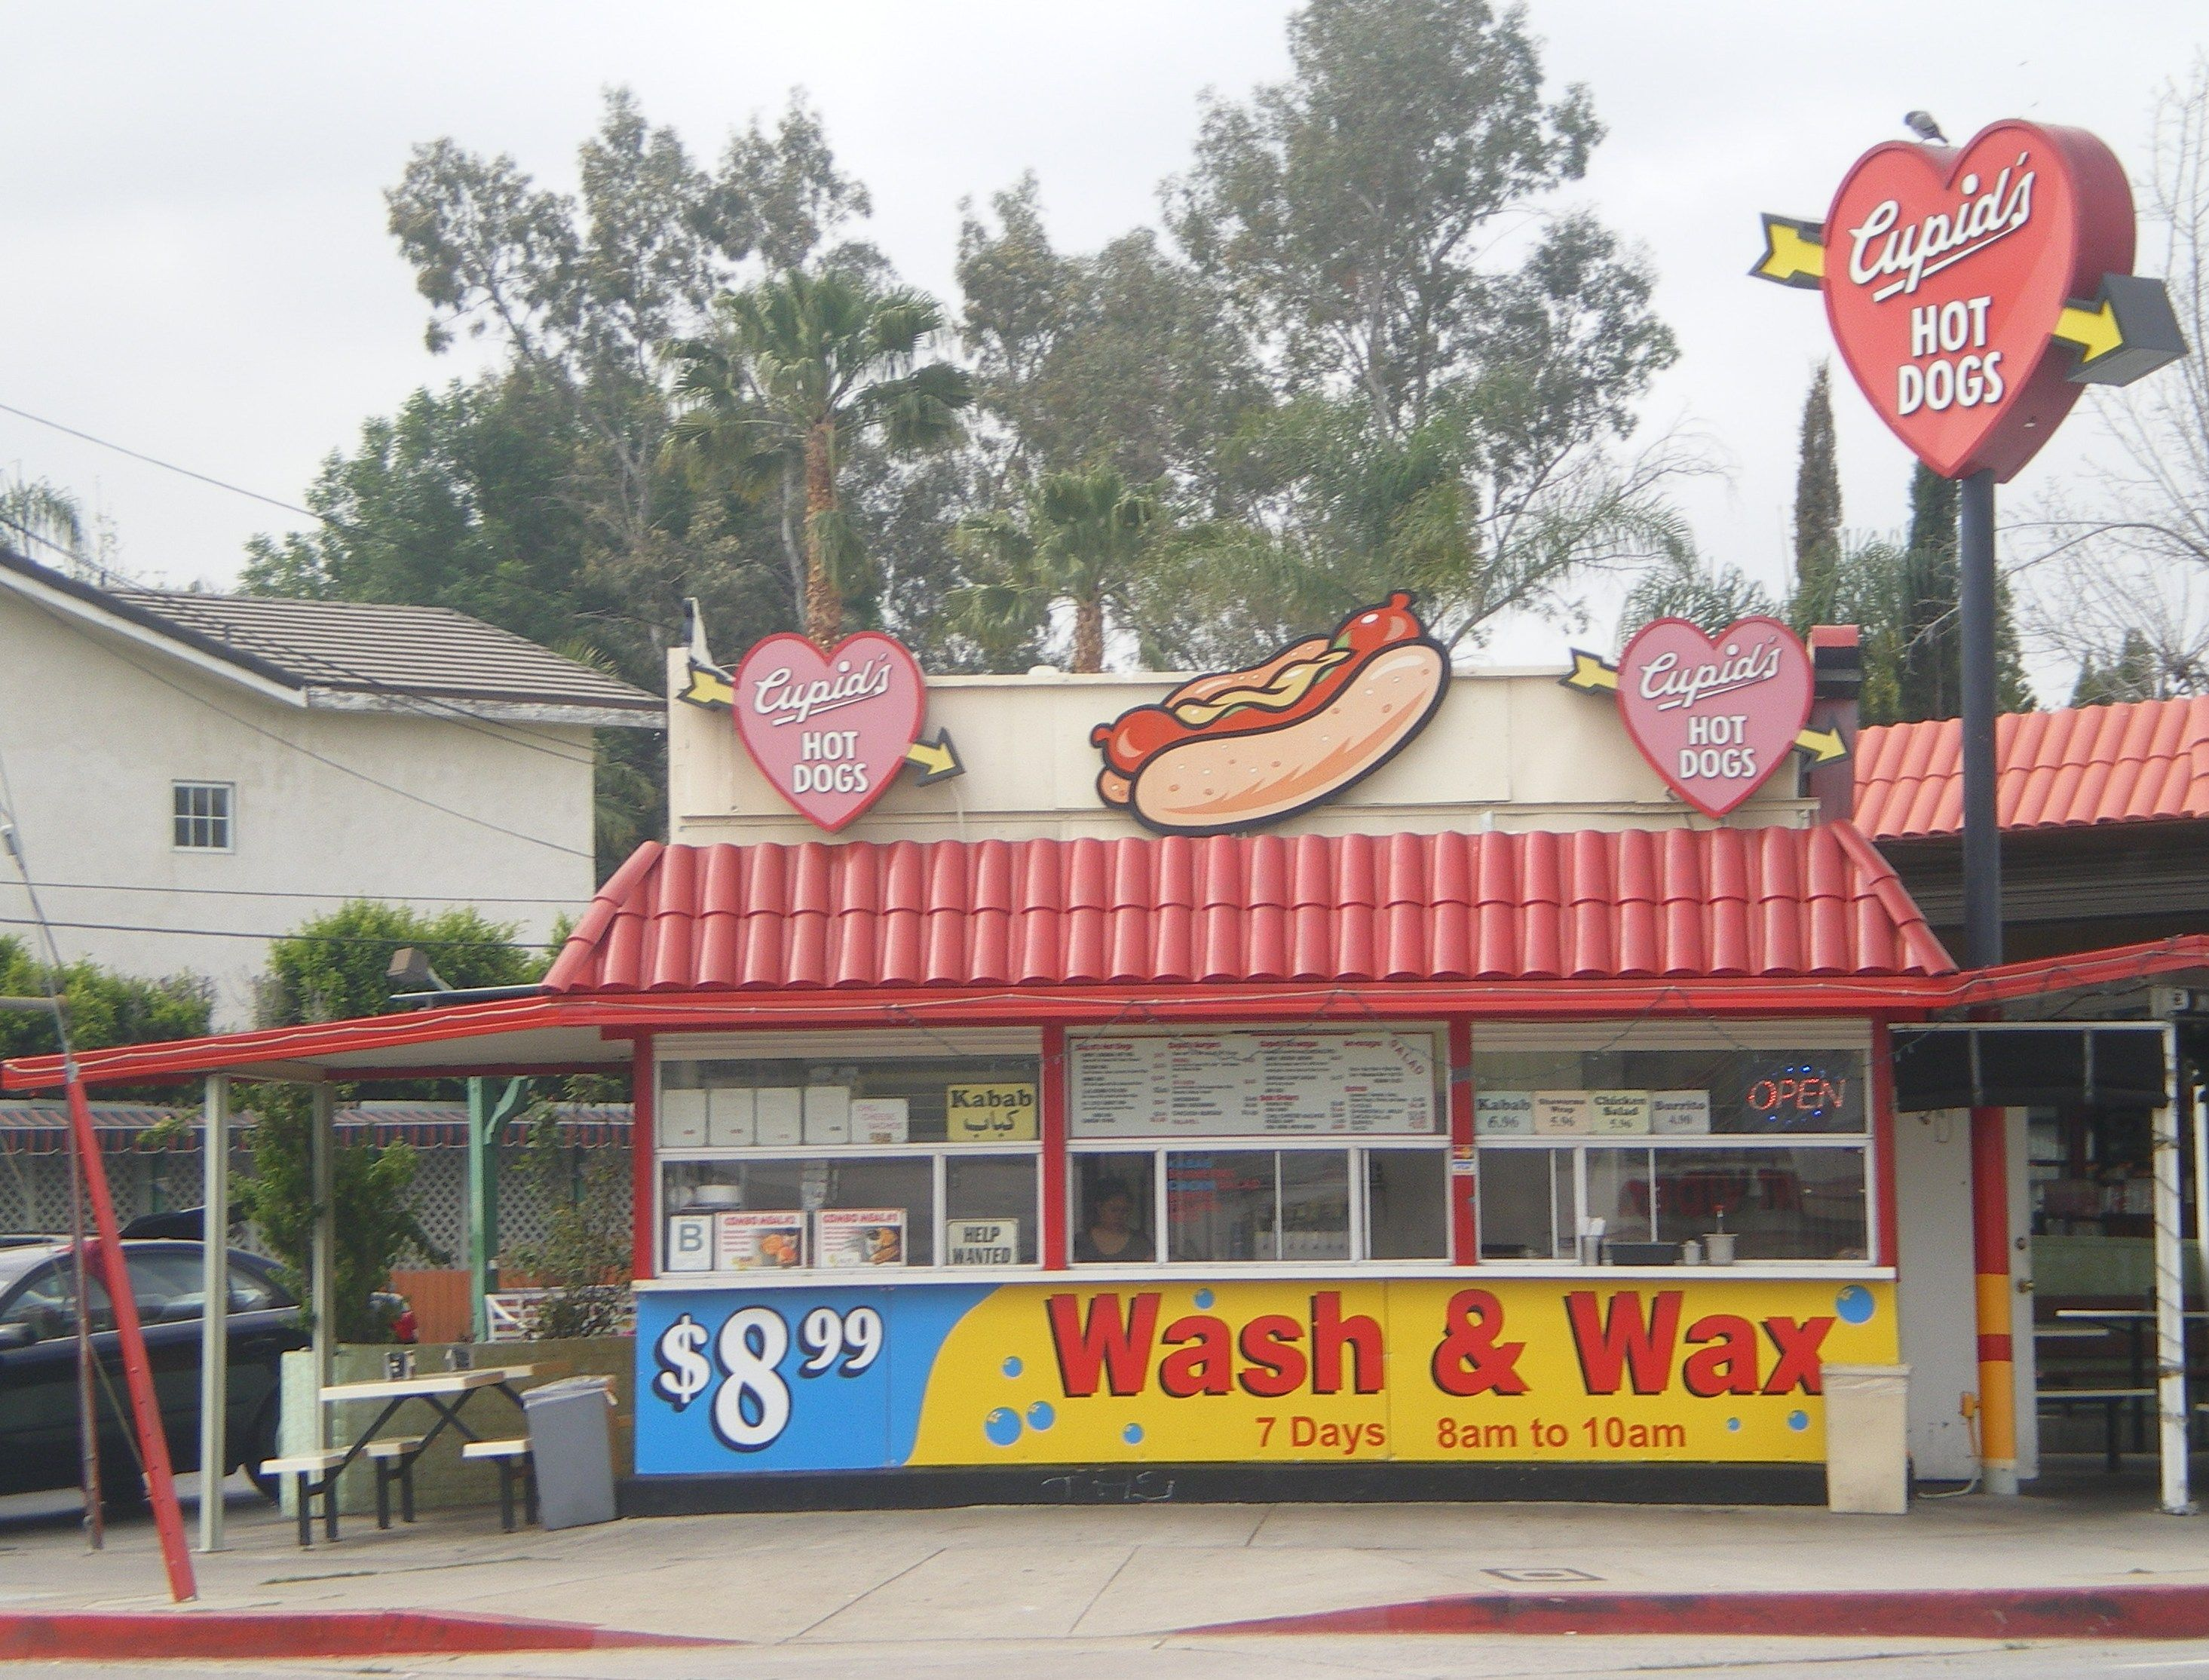 Google Image Result for http://upload.wikimedia.org/wikipedia/commons/c/cb/Cupid%27s_Hot_Dogs,_Ventura_Blvd.,_Tarzana,_California.JPG